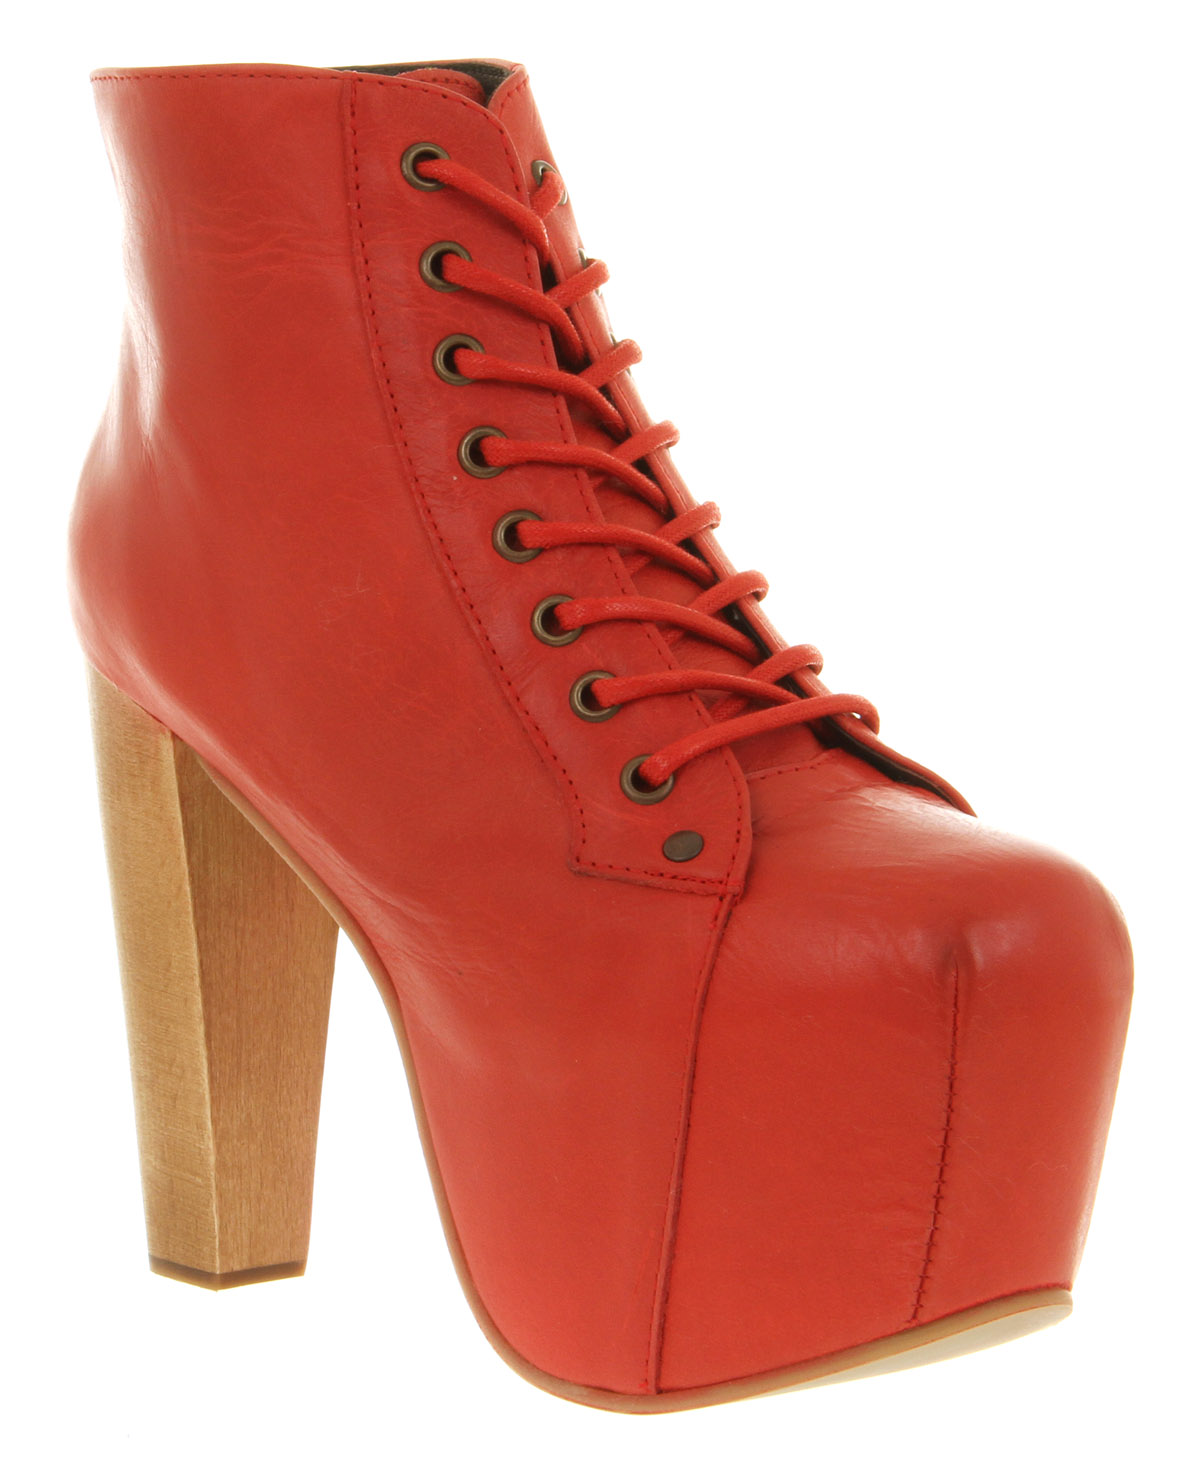 jeffrey campbell lita platform ankle boot red leather in red lyst. Black Bedroom Furniture Sets. Home Design Ideas